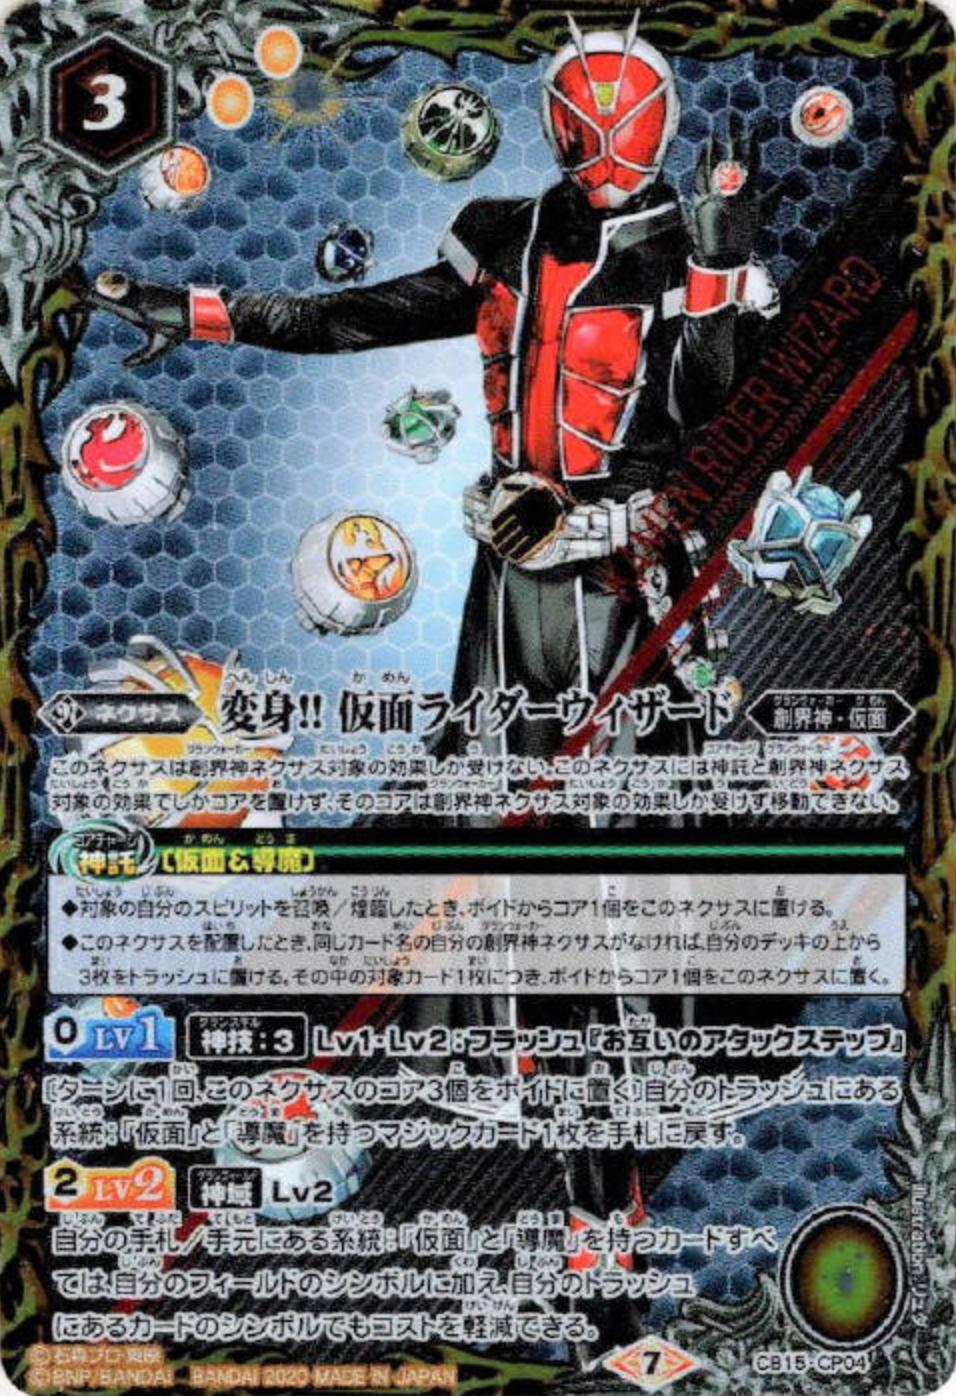 Henshin!! Kamen Rider Wizard